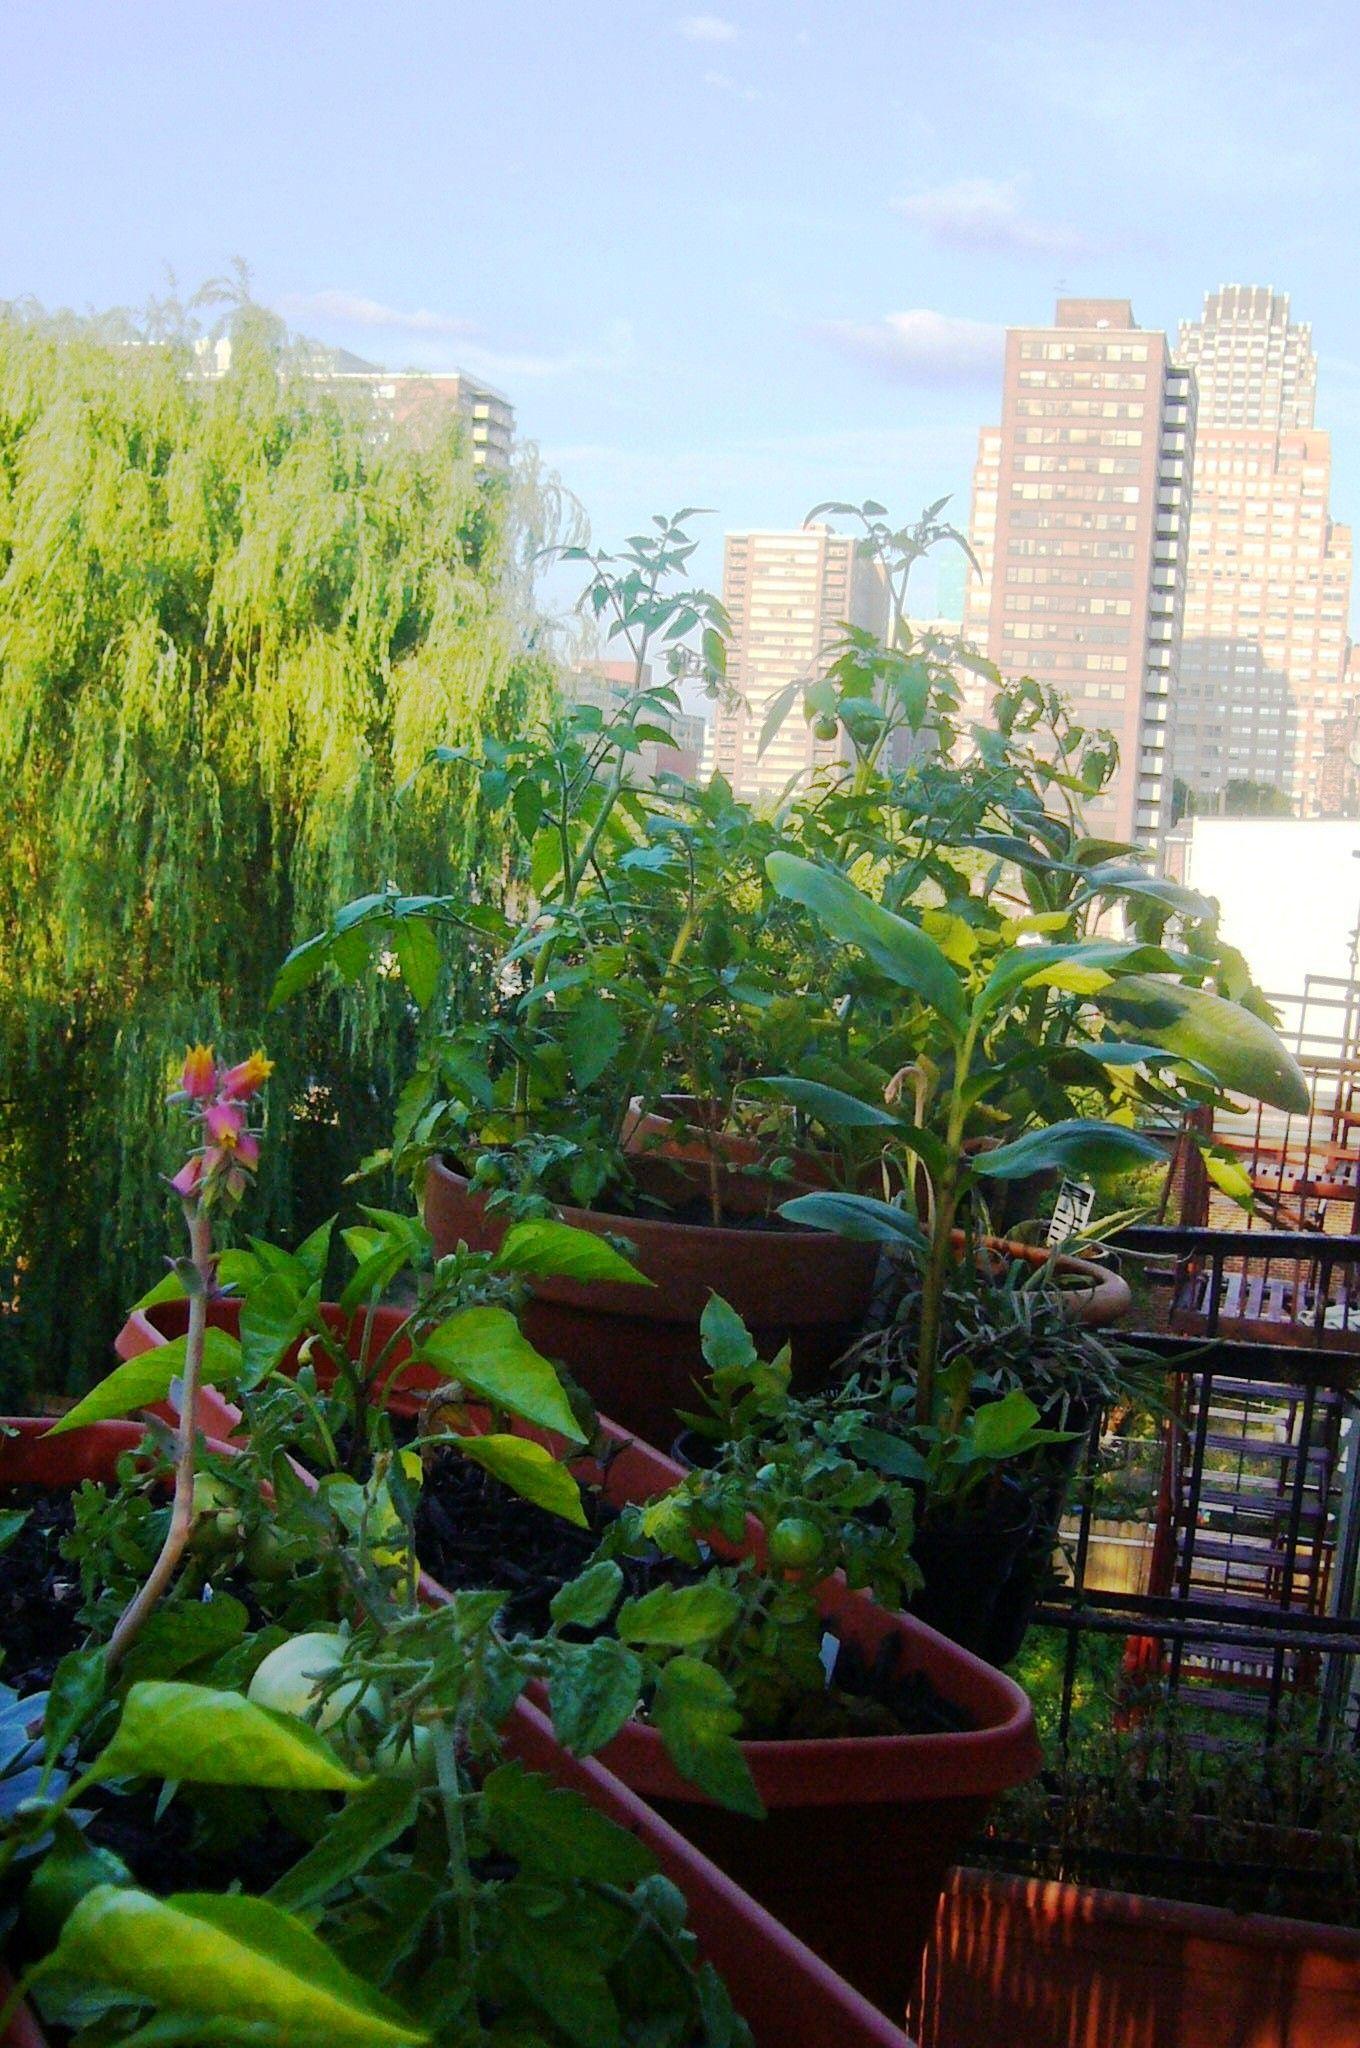 Fire Escape Garden In Jersey City Nj Grove Design Grovedesign Www Grovedesignstudio Com Container Gardening Urban Garden Plants